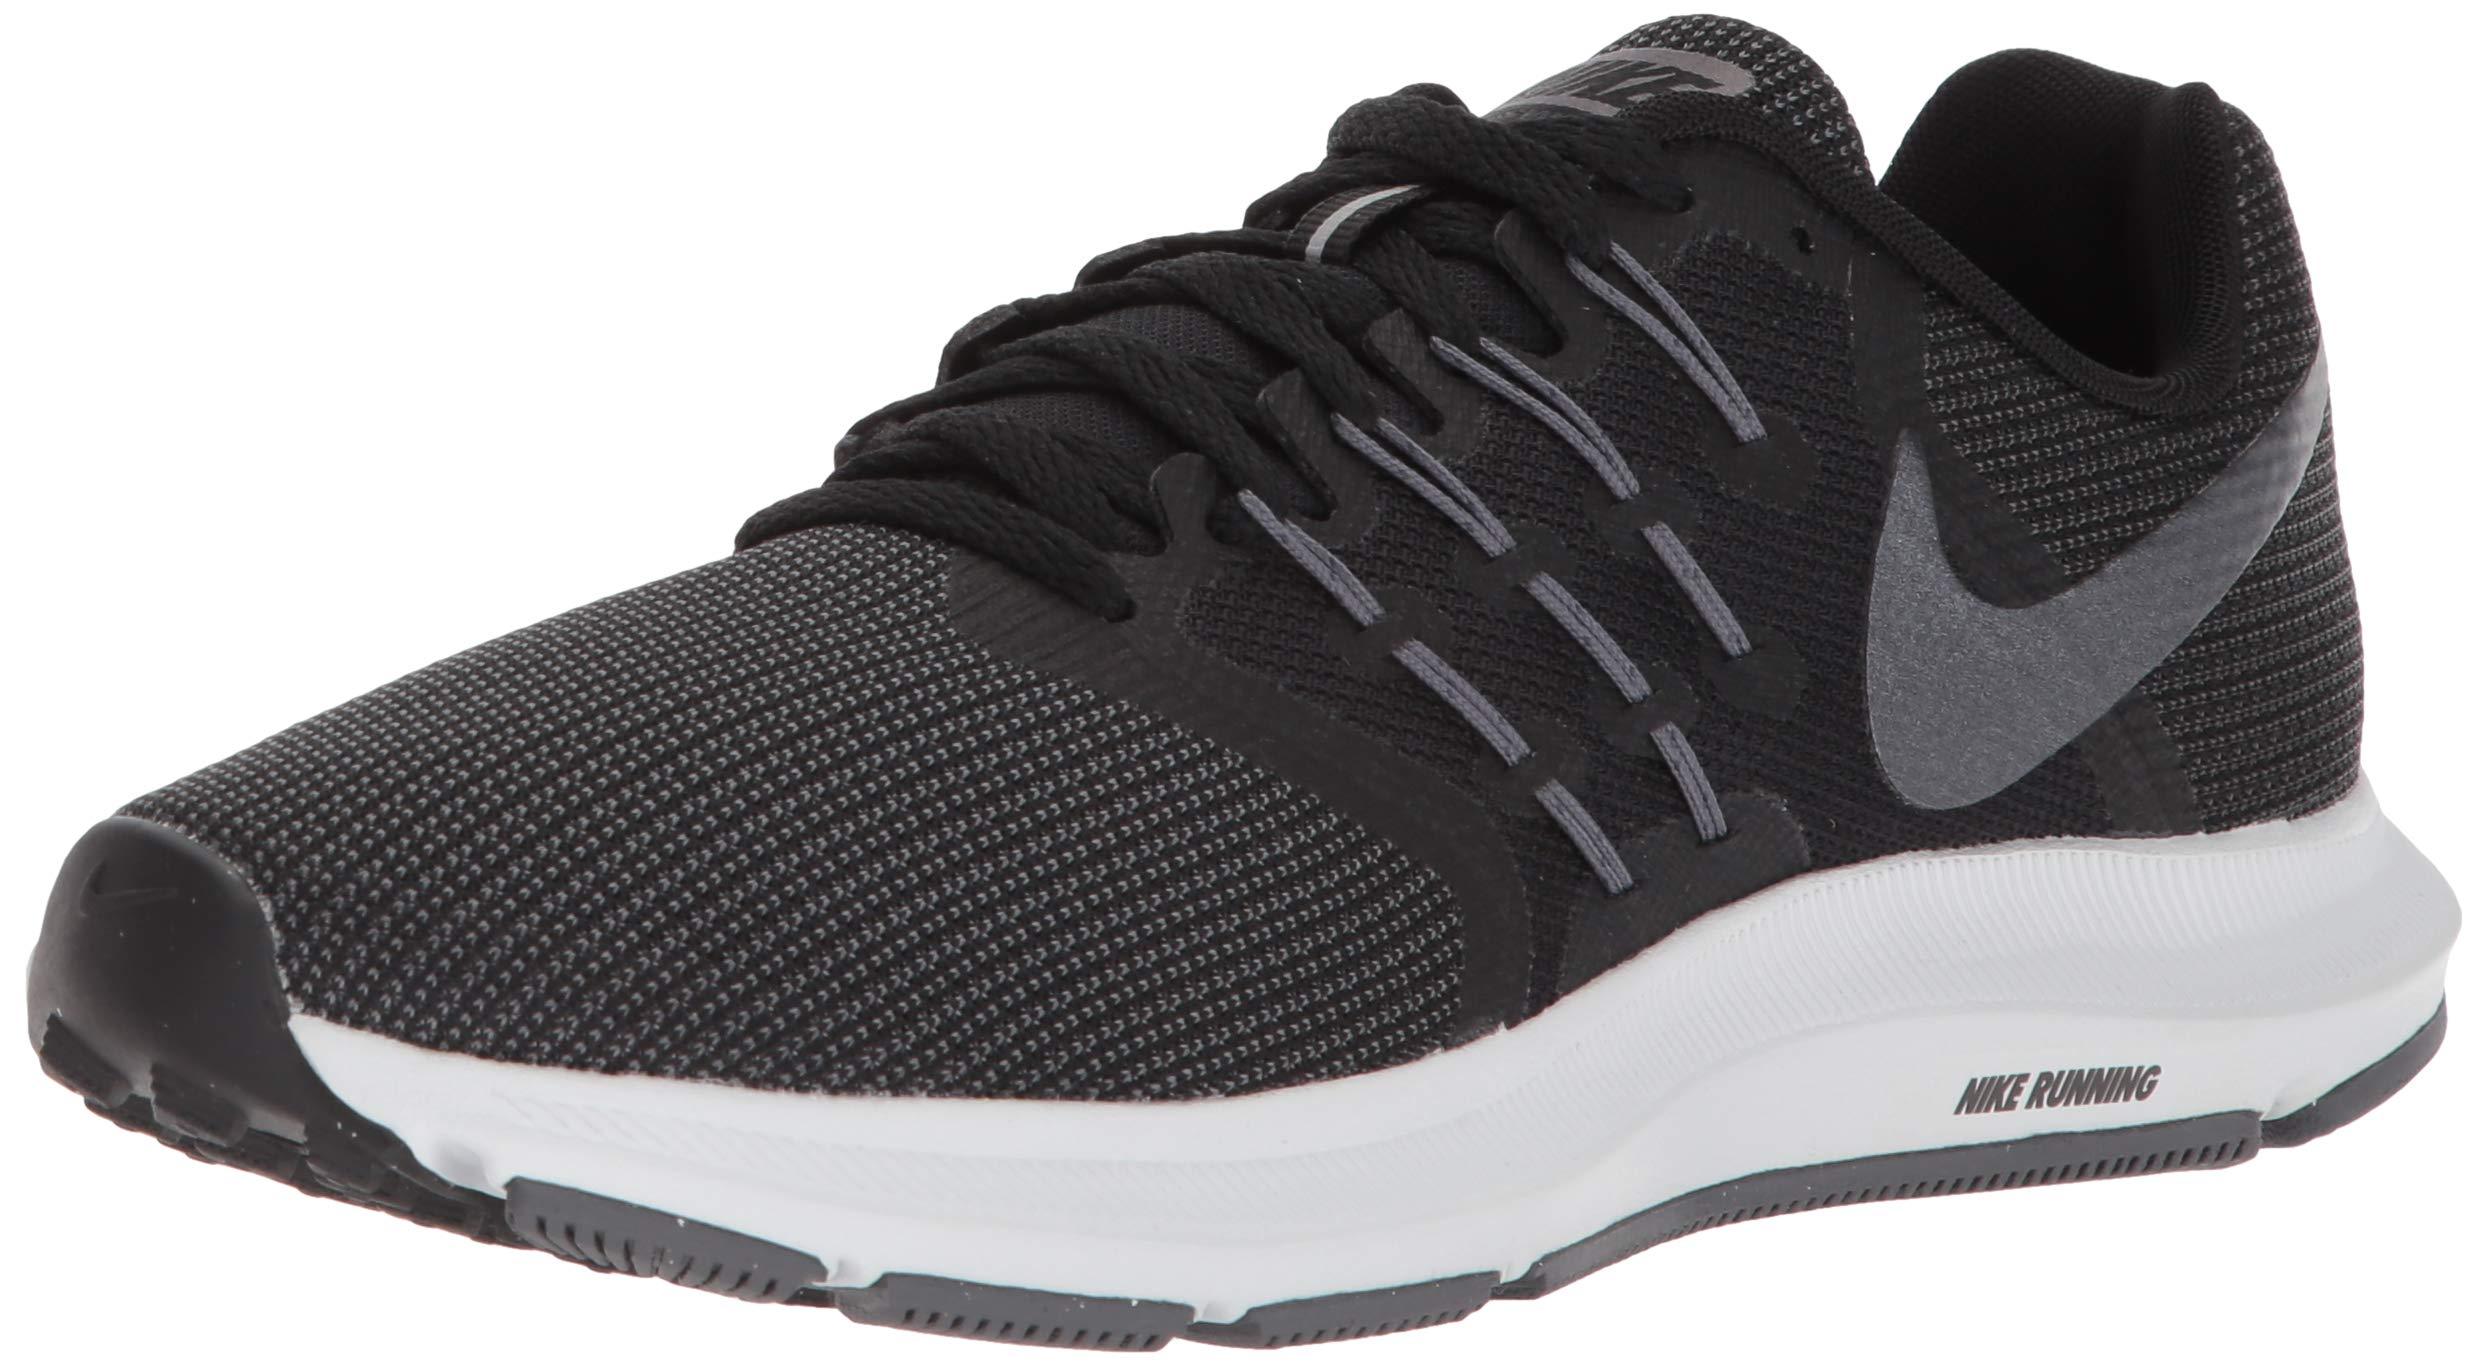 FemmeNoirblack Hematite Running Nike SwiftChaussures mtlc Run Wmns Eu Grey01039 dark De dBCQExeWor